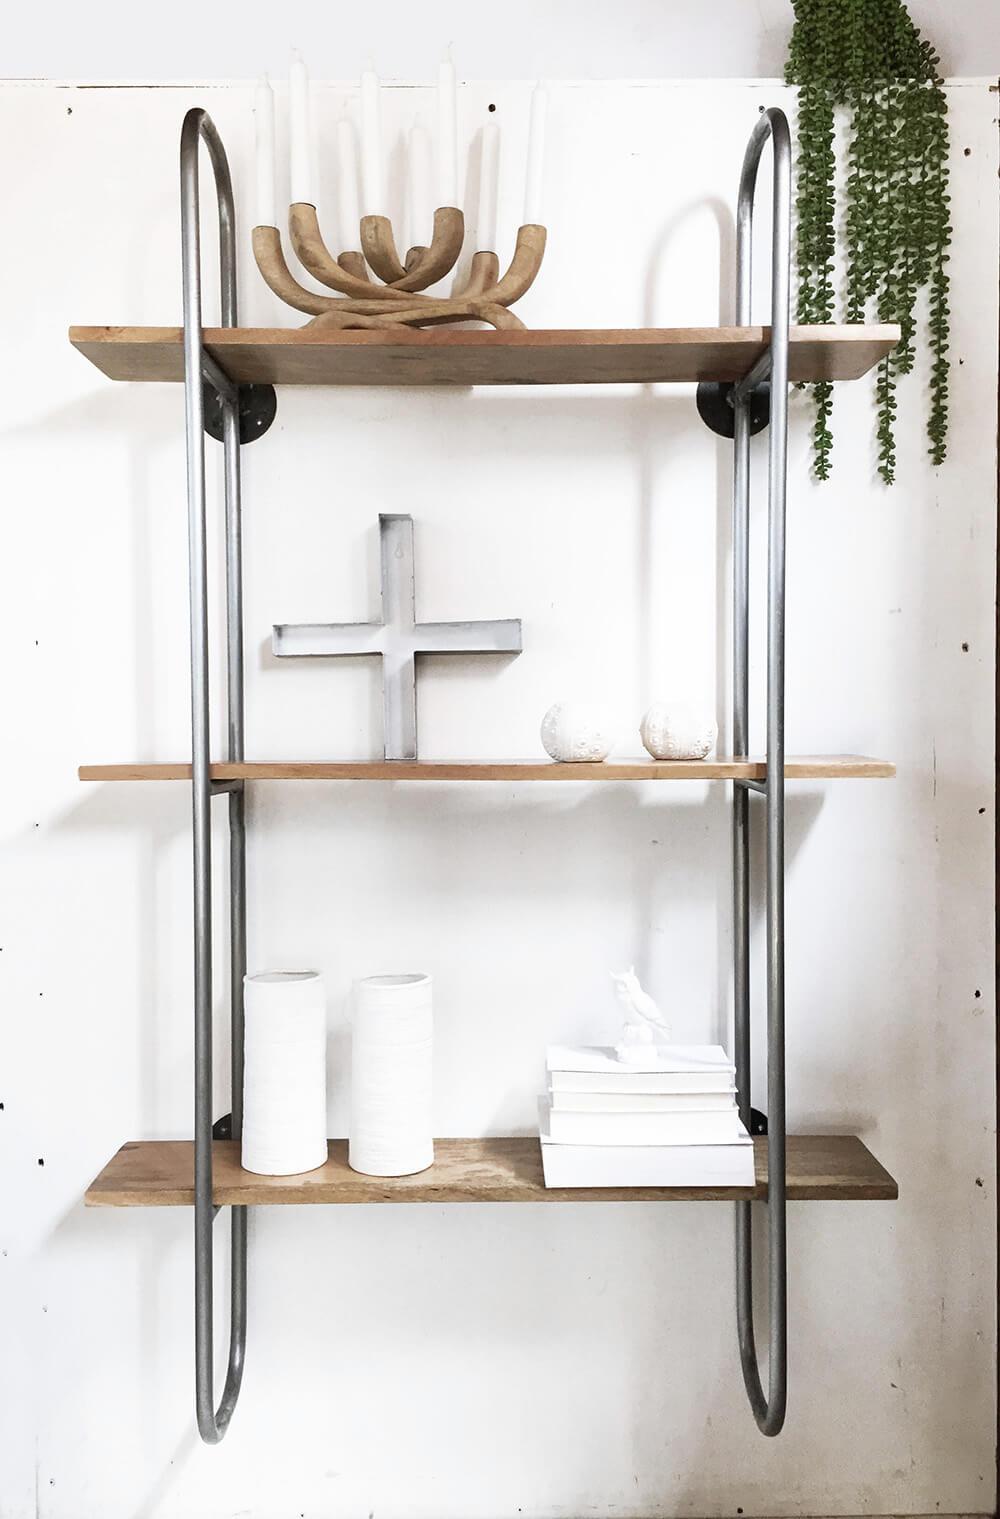 Umbra Cubist Wandrek : Wandrek goedkope meubels goedkope meubels